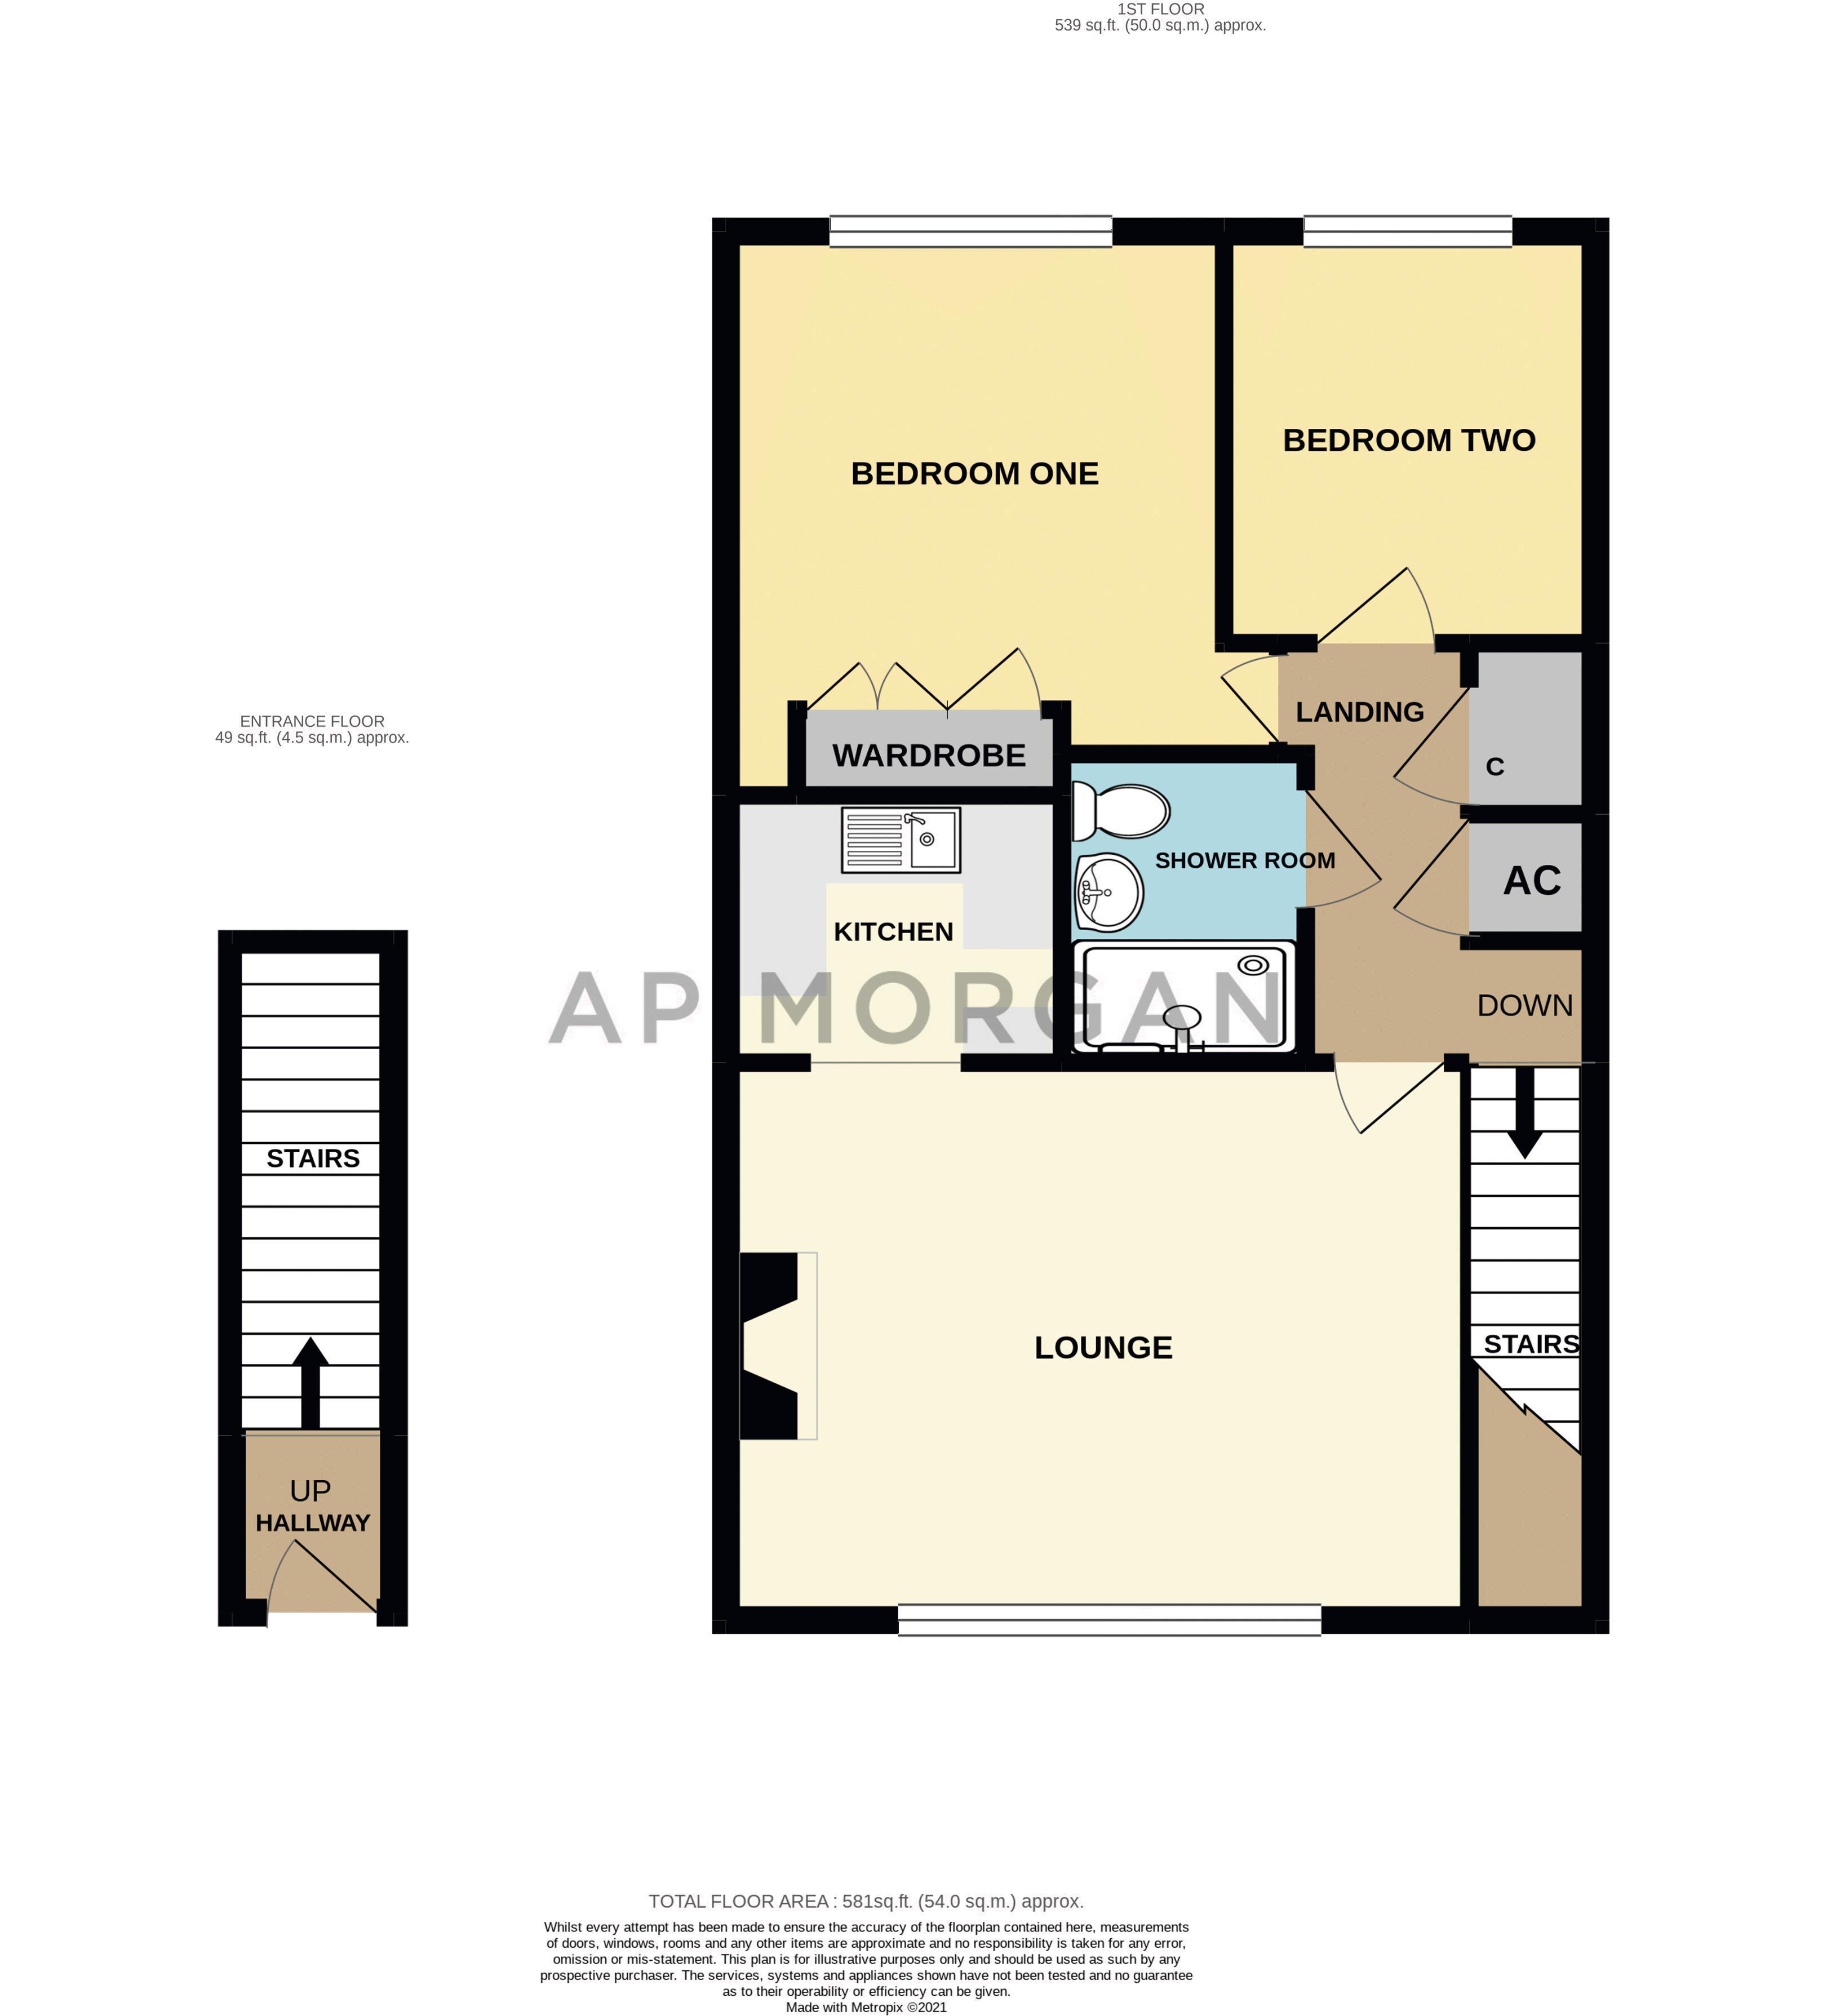 2 bed  for sale in Housman Park - Property Floorplan